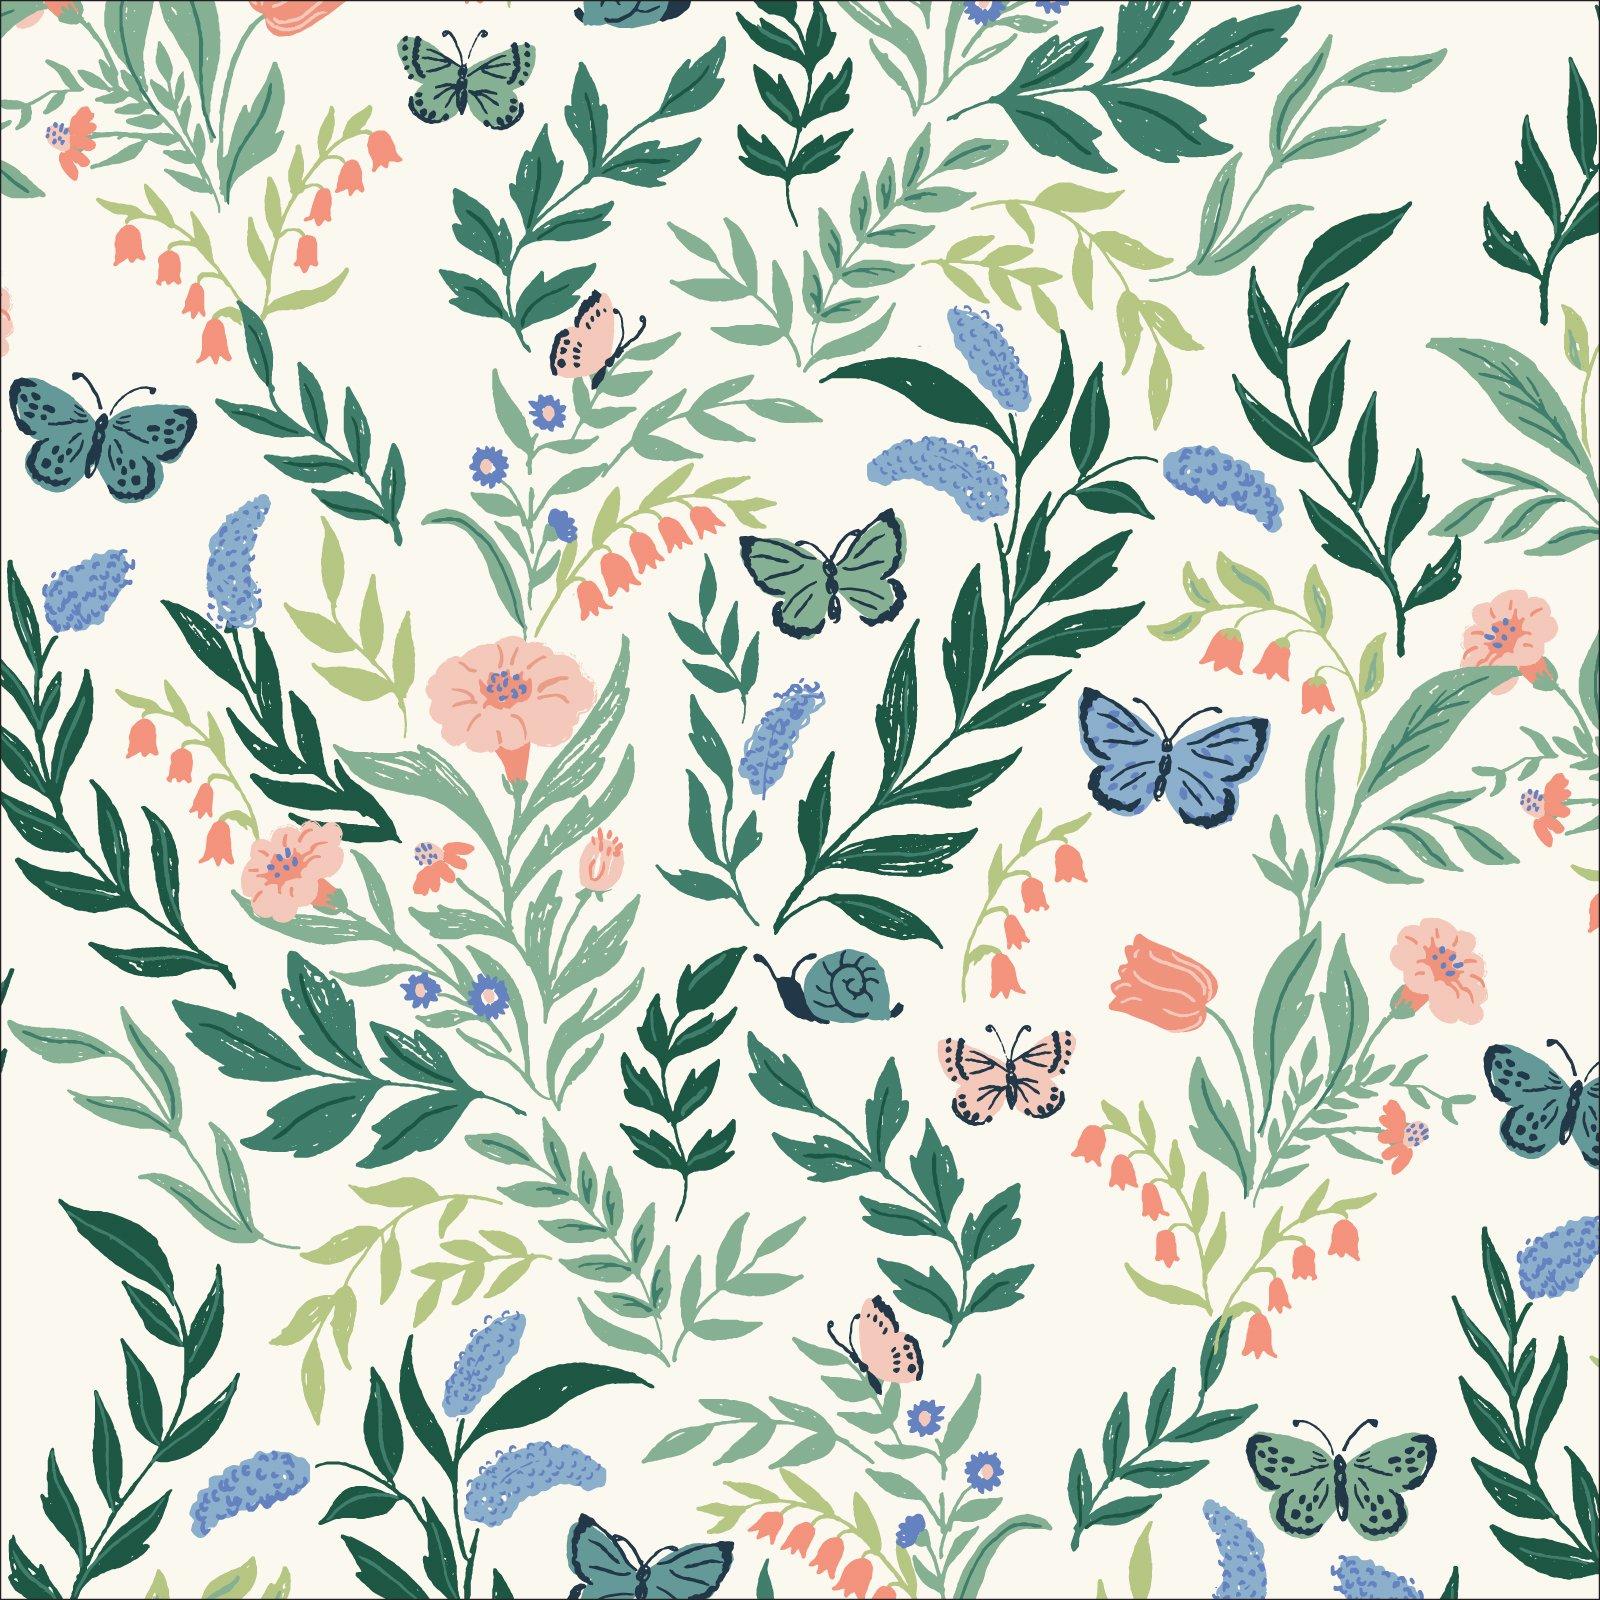 Flora - Perennial - Cloud 9 Organic Cotton